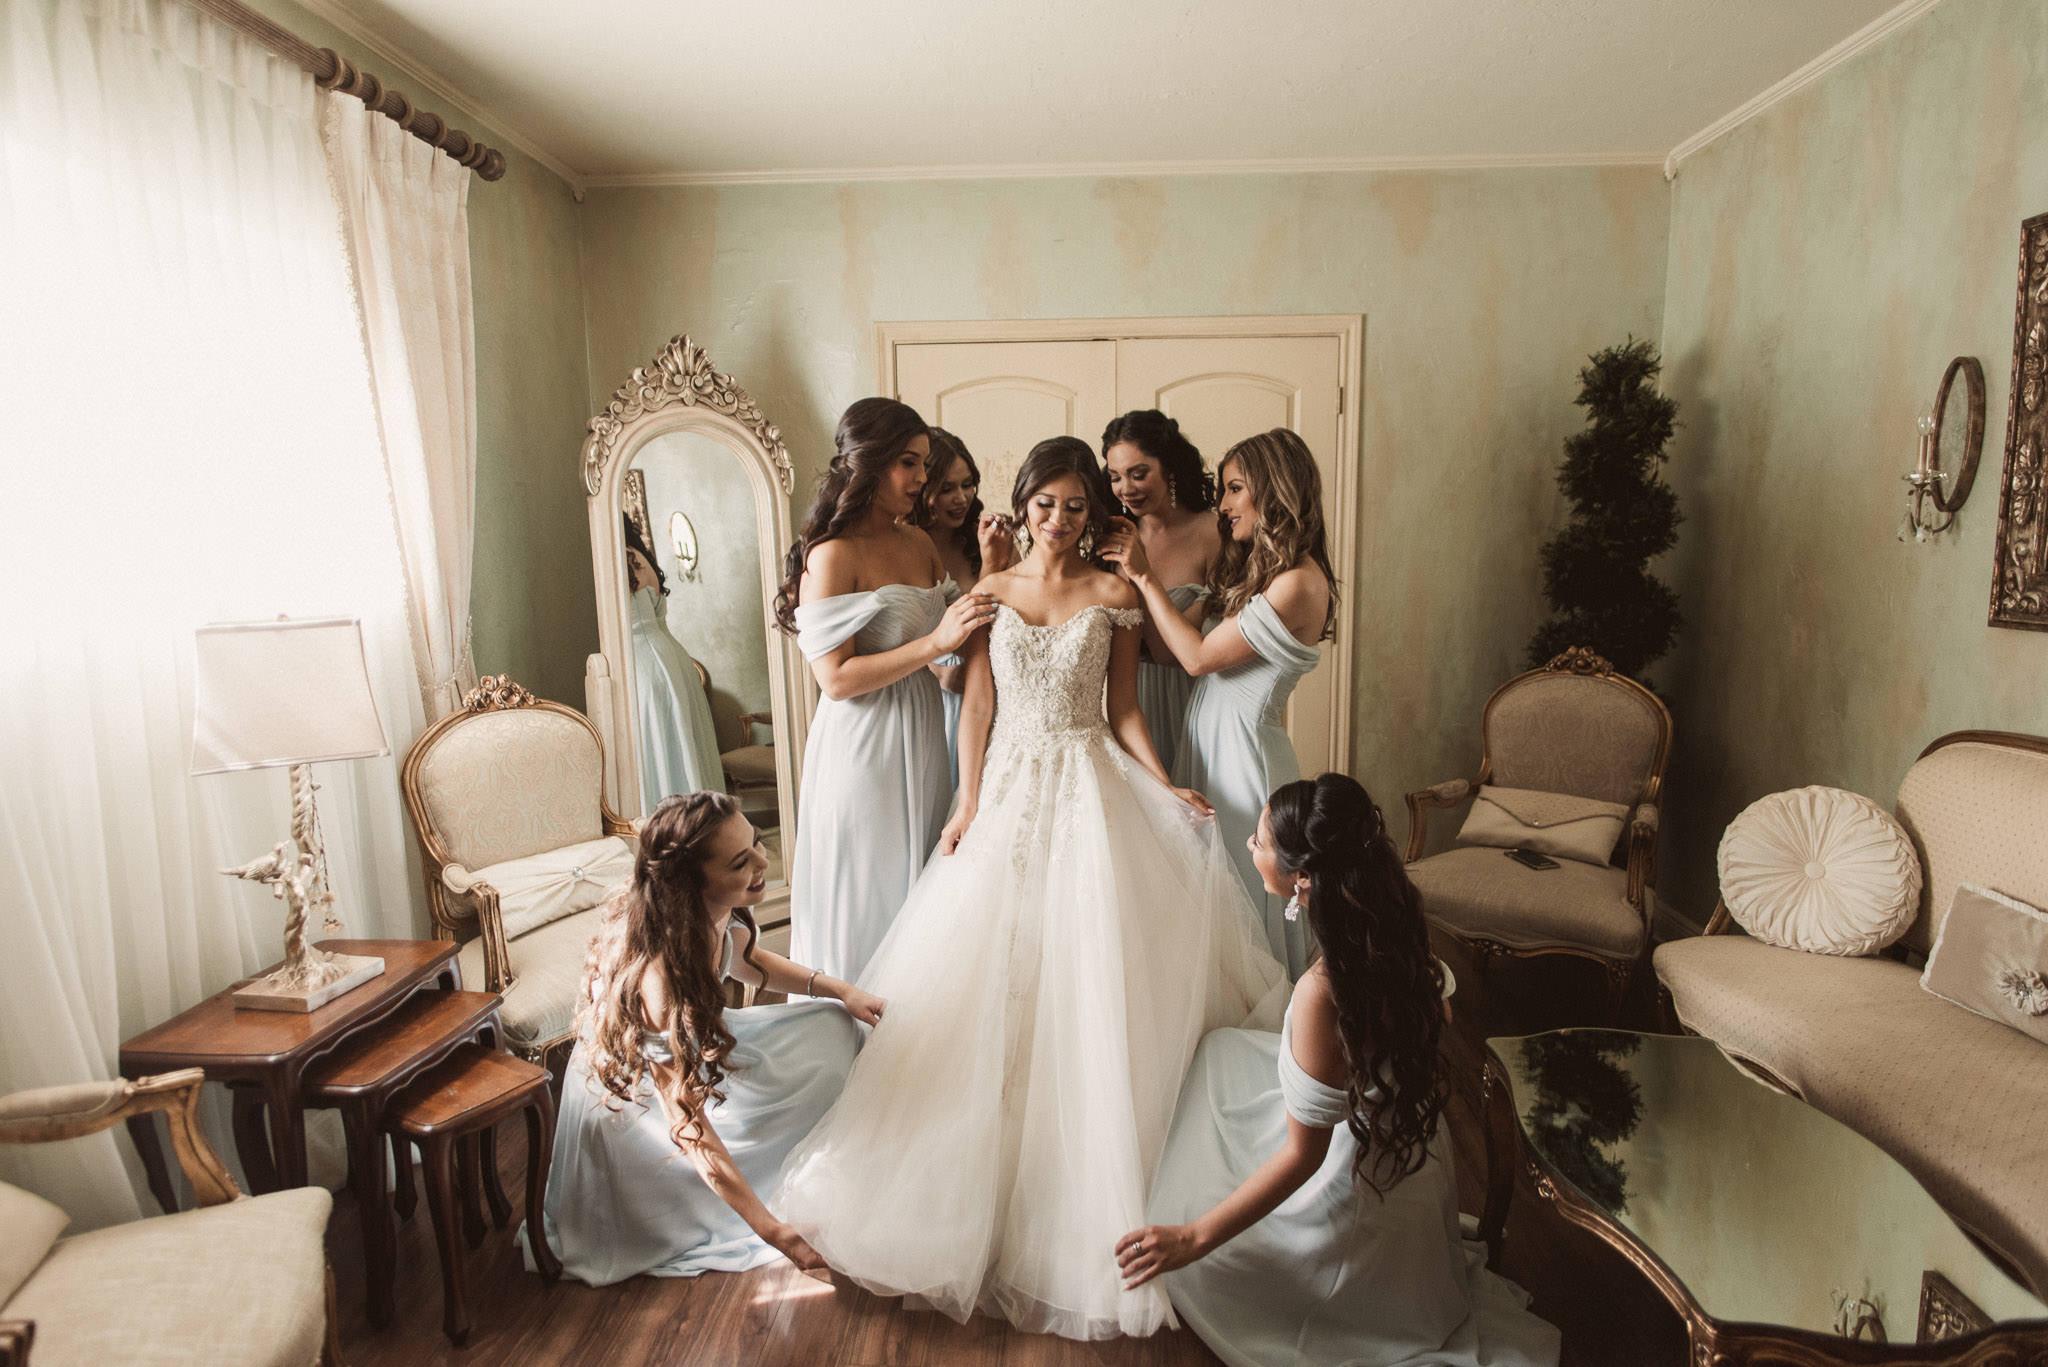 adriana-christian-wedding-re-sm-43.jpg